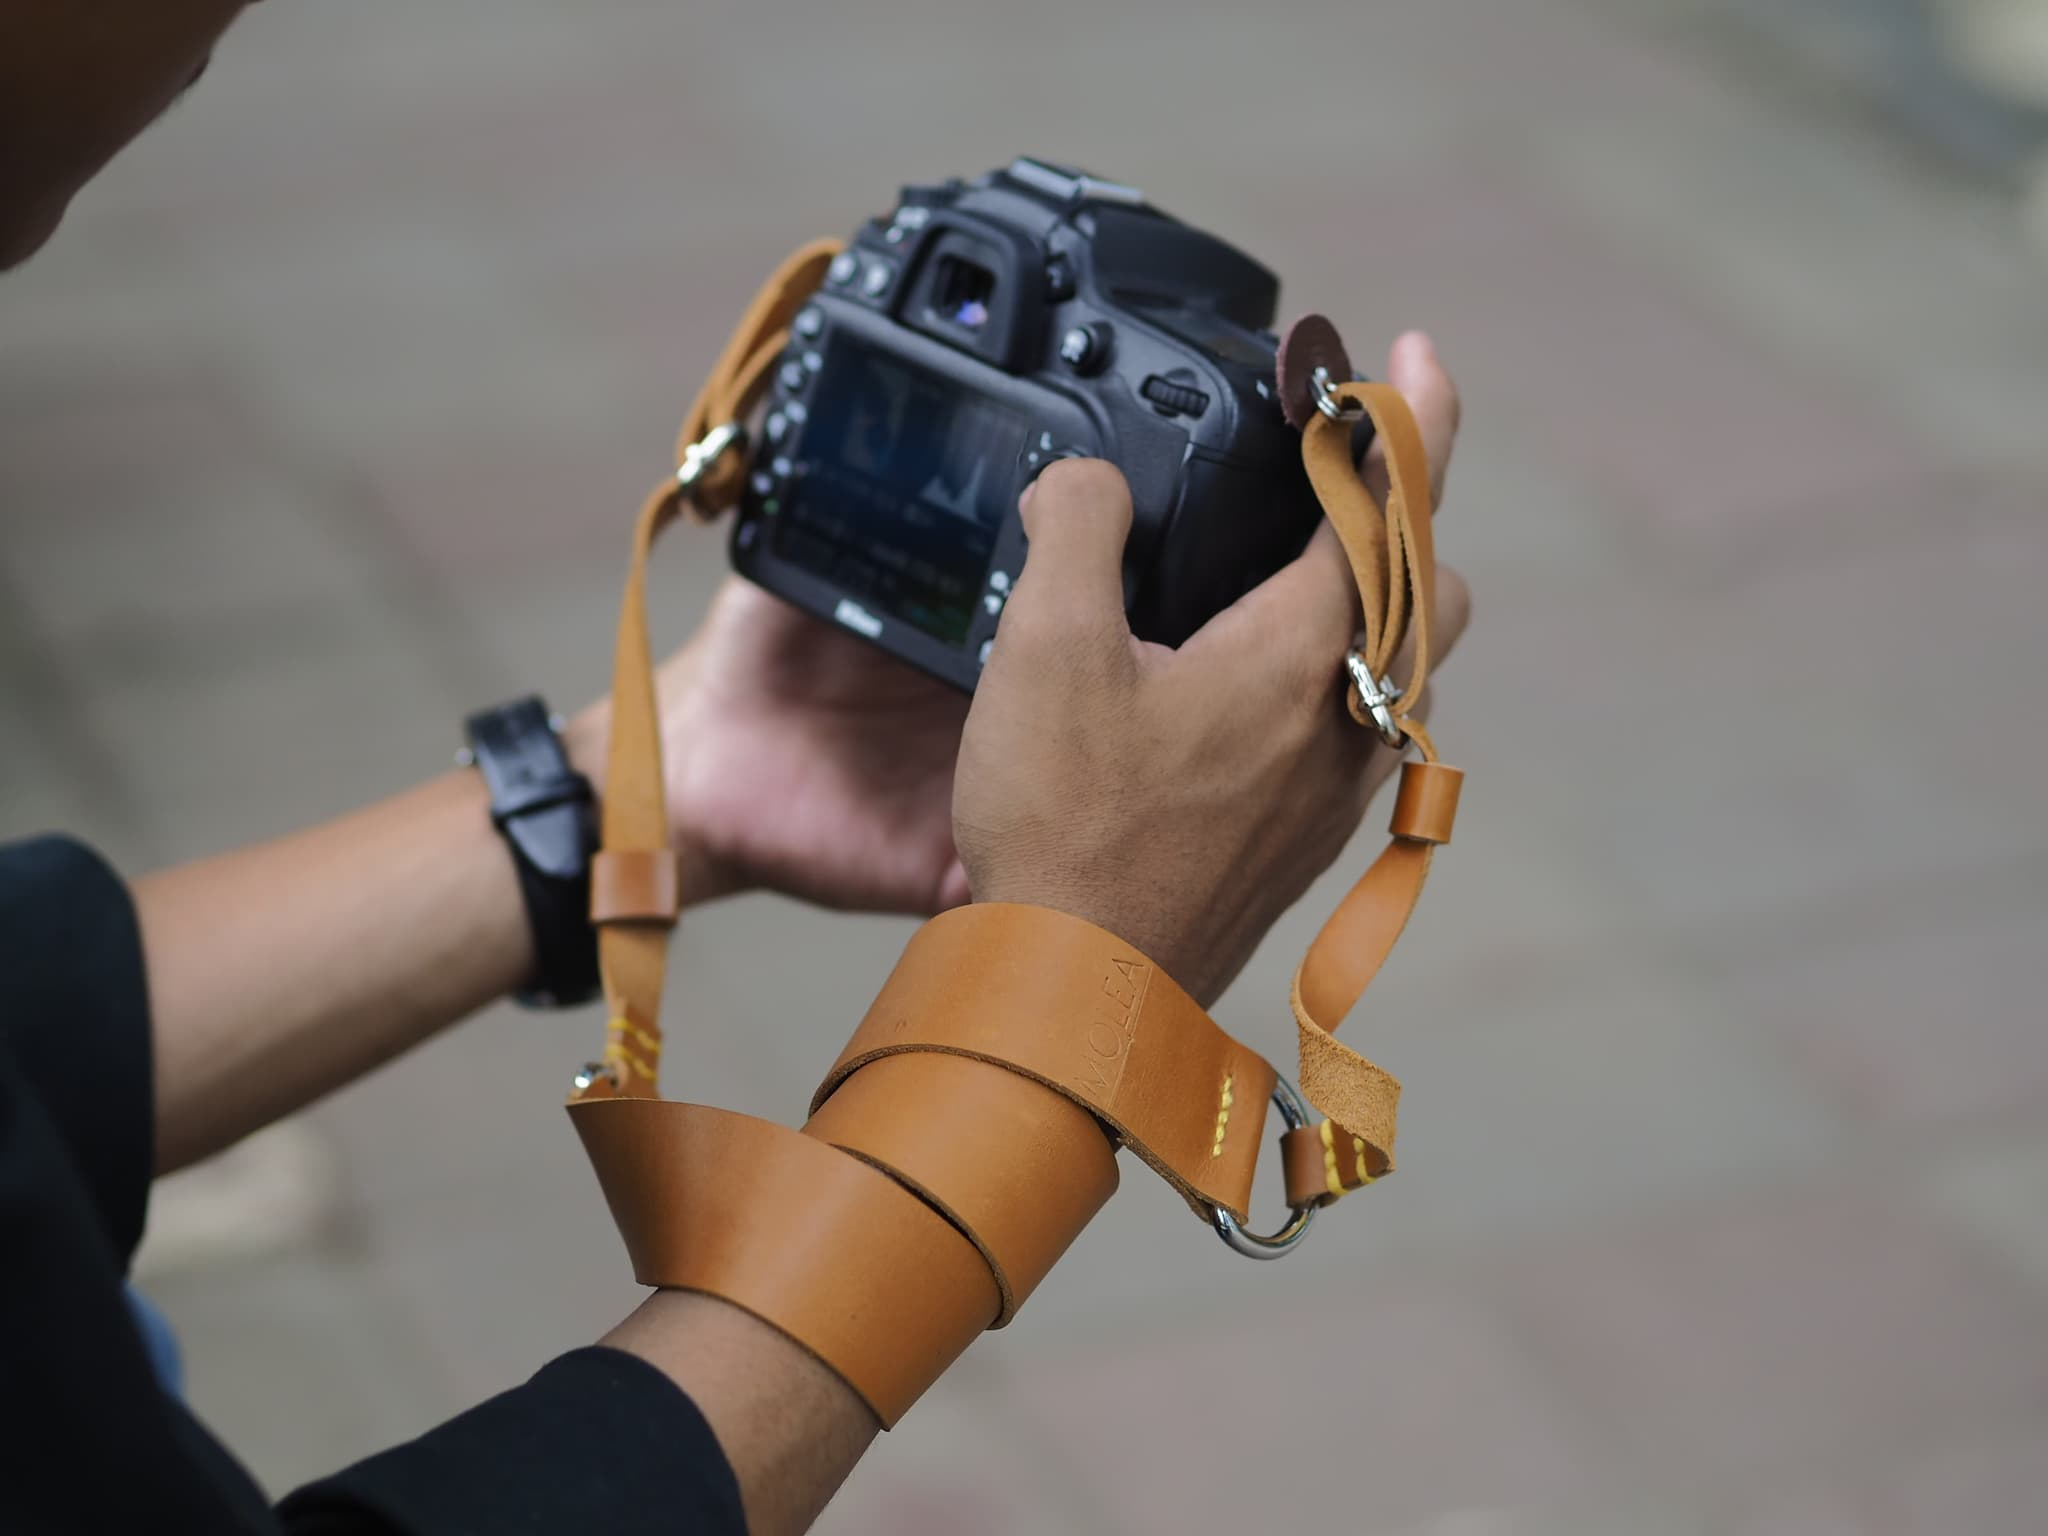 Strap Camera / Neck Strap Camera / Tali Kamera / Leather Strap Camera - Blanja.com